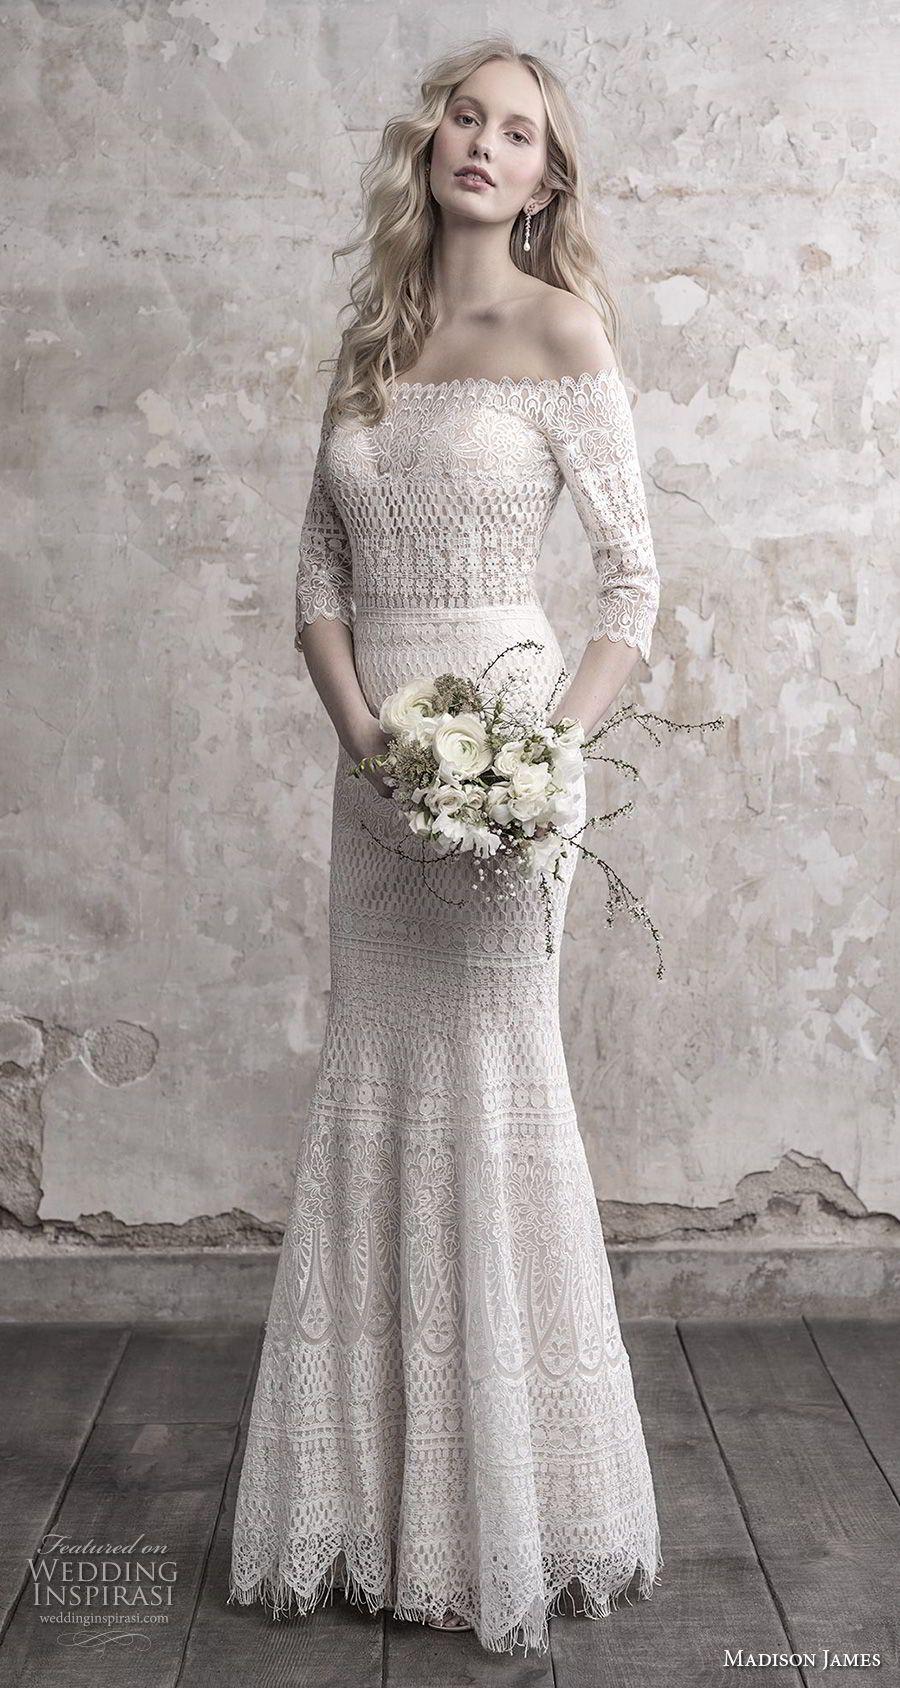 Madison James Fall 2018 Wedding Dresses Wedding Inspirasi Wedding Dress Styles Bridal Dresses Vintage Wedding Dresses Lace [ 1688 x 900 Pixel ]